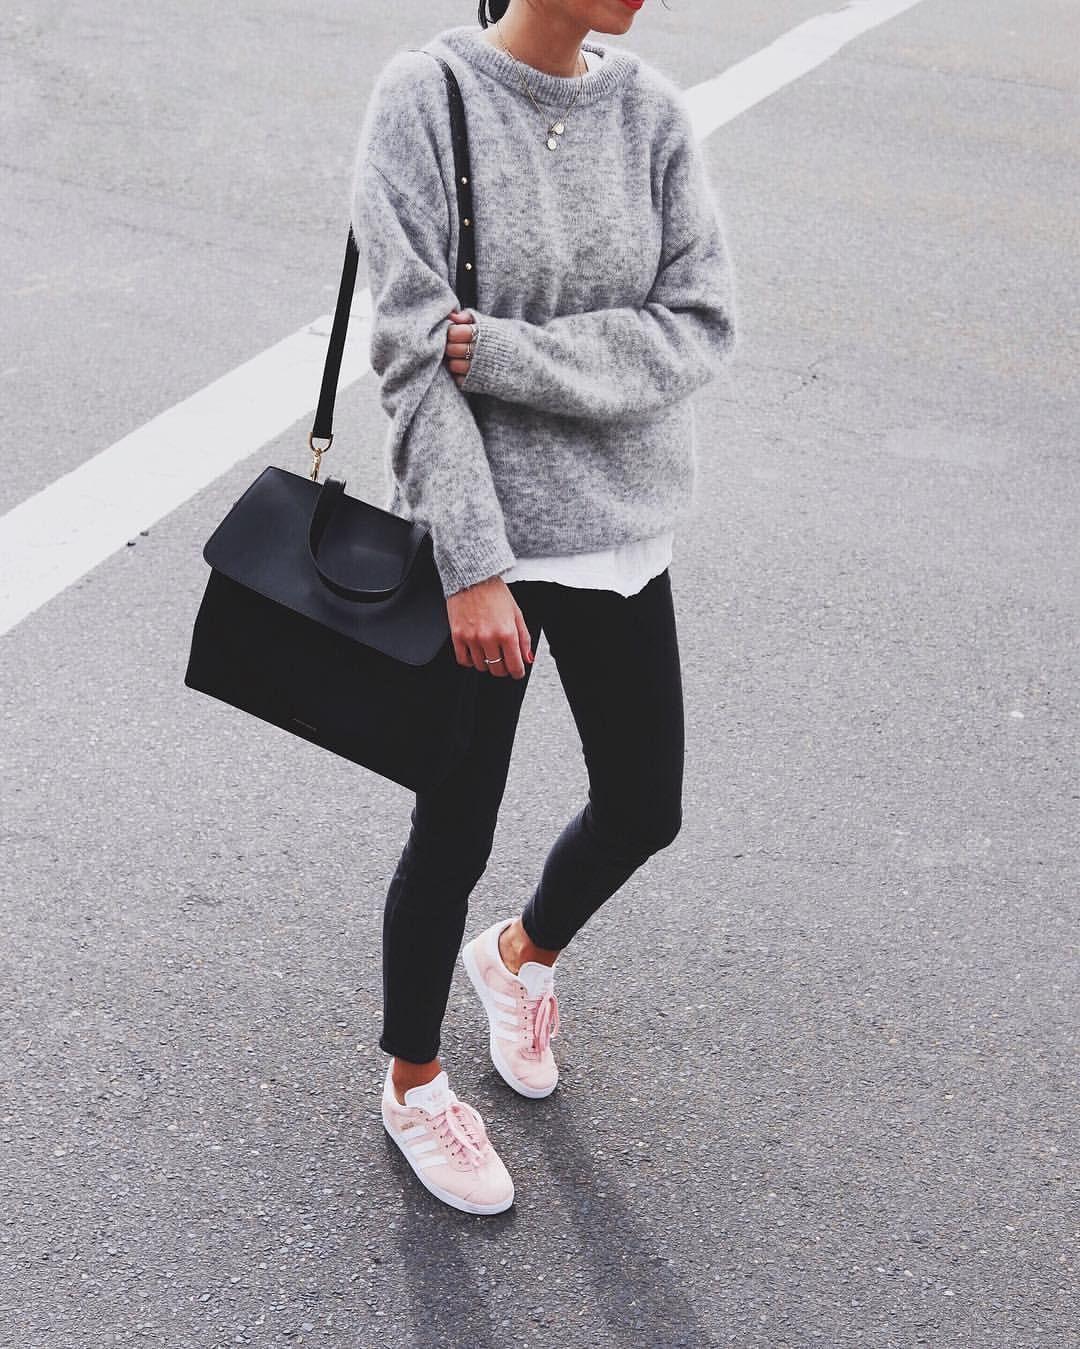 adidas superstar femme instagram